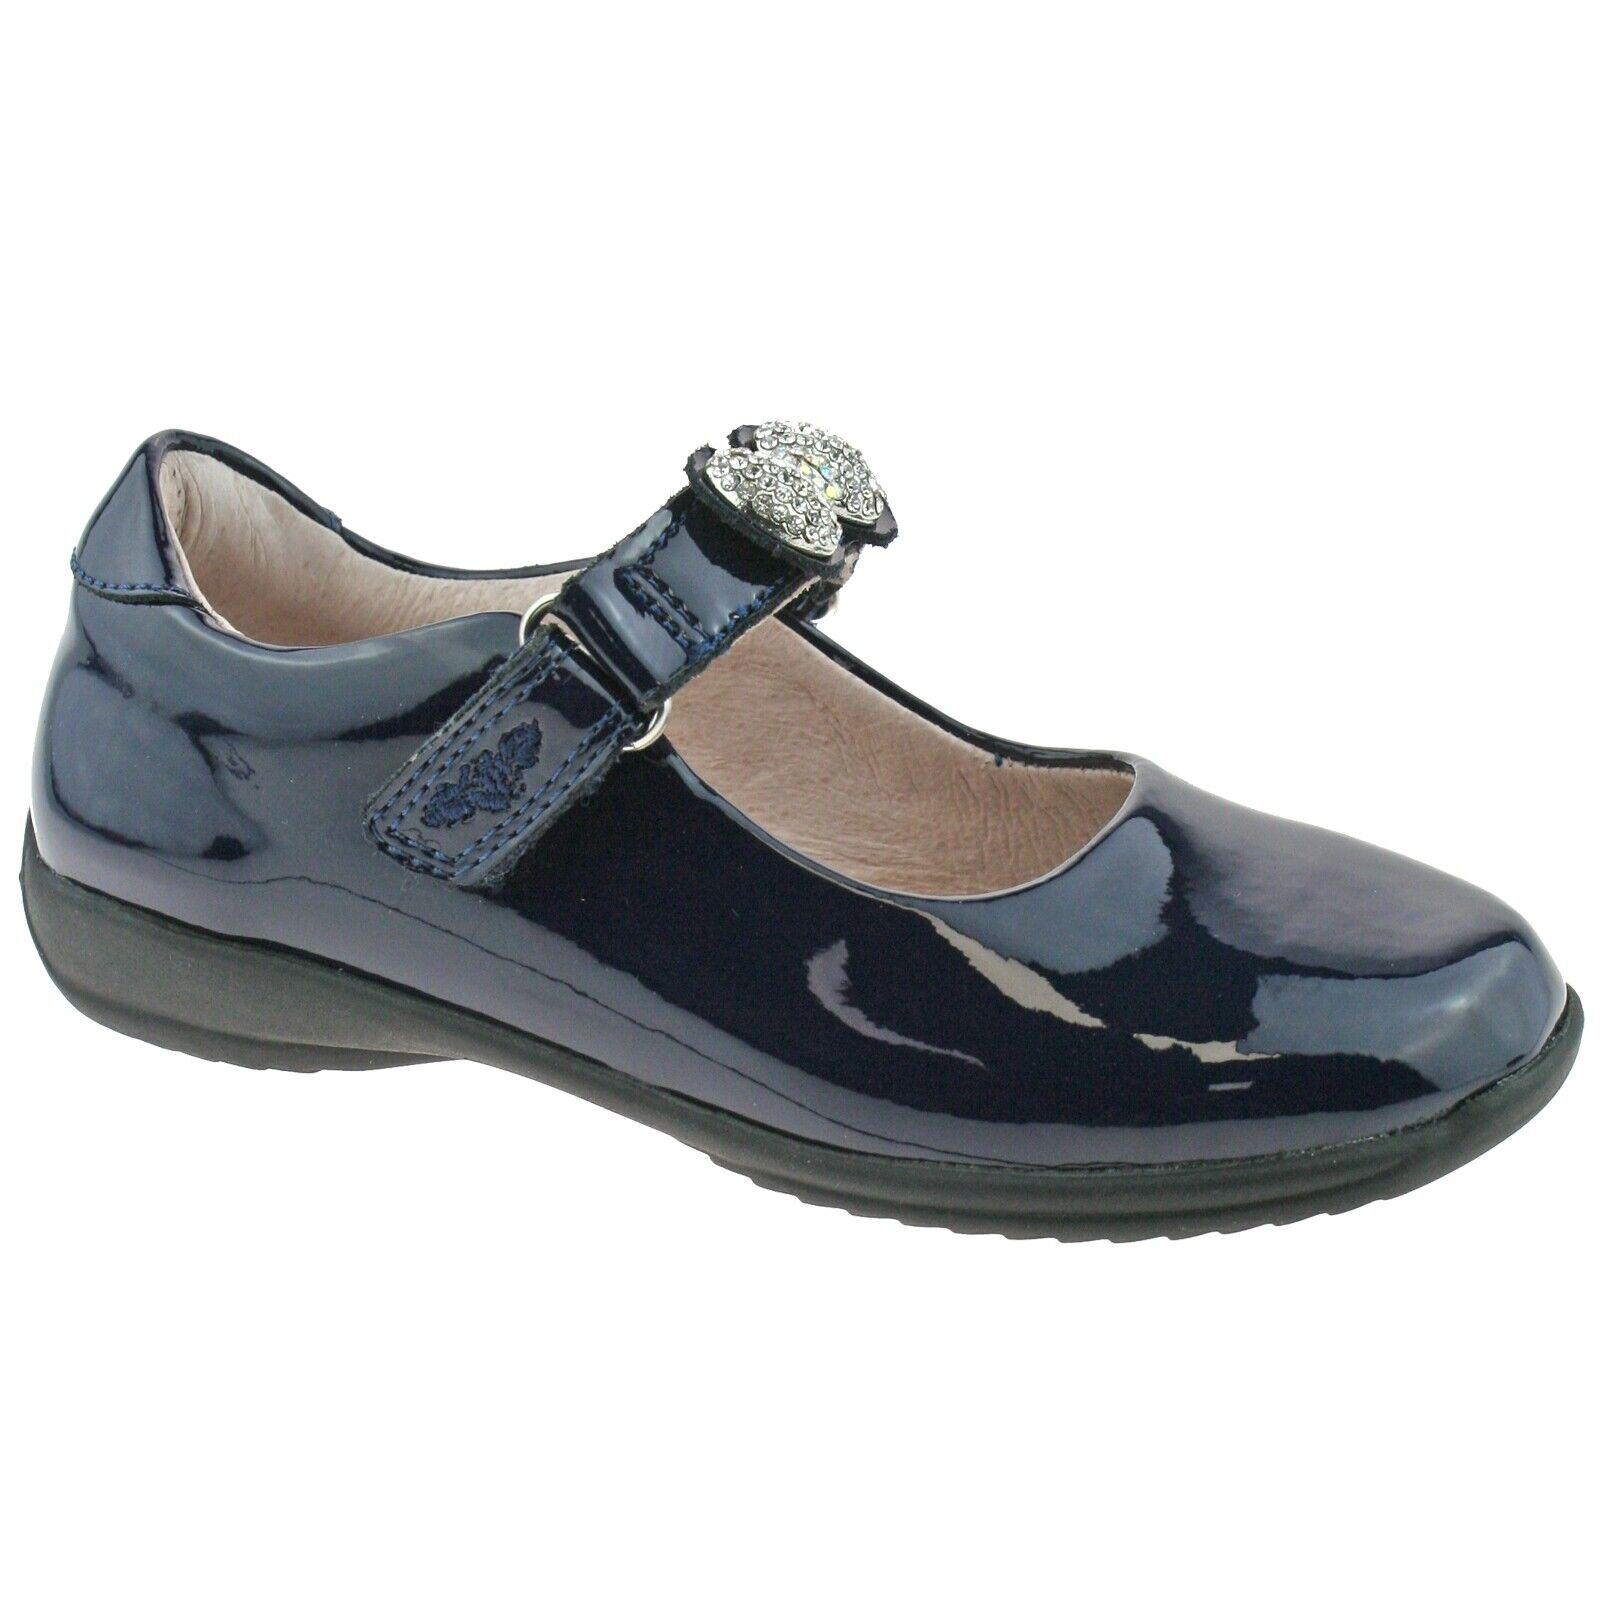 Mandy Navy Blue Patent School Shoes F